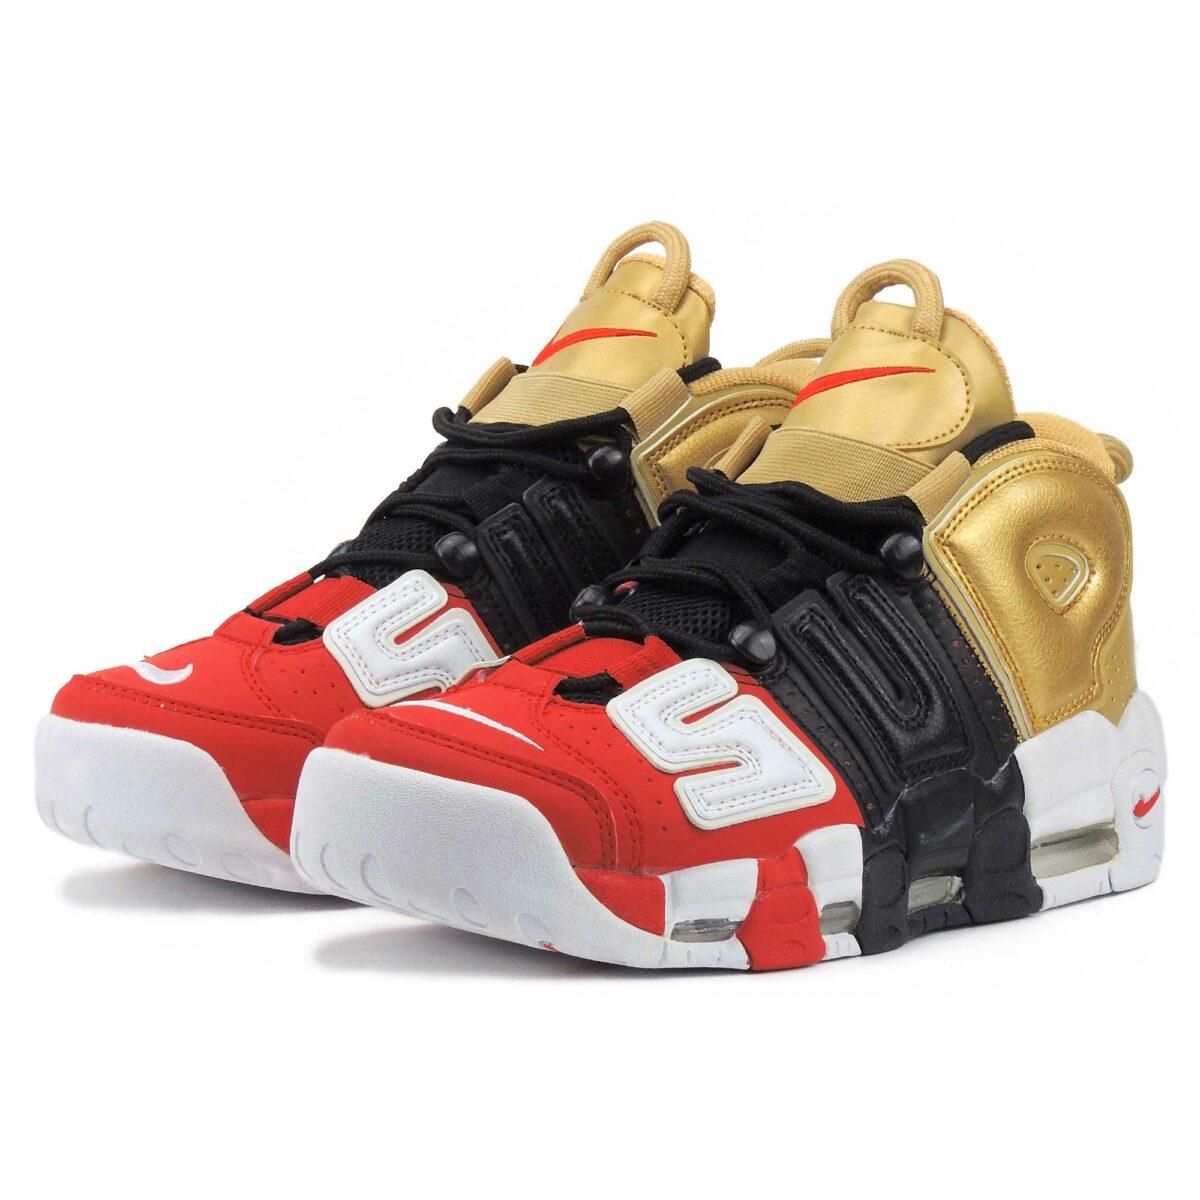 nike air more uptempo red black gold 902290_002 купить